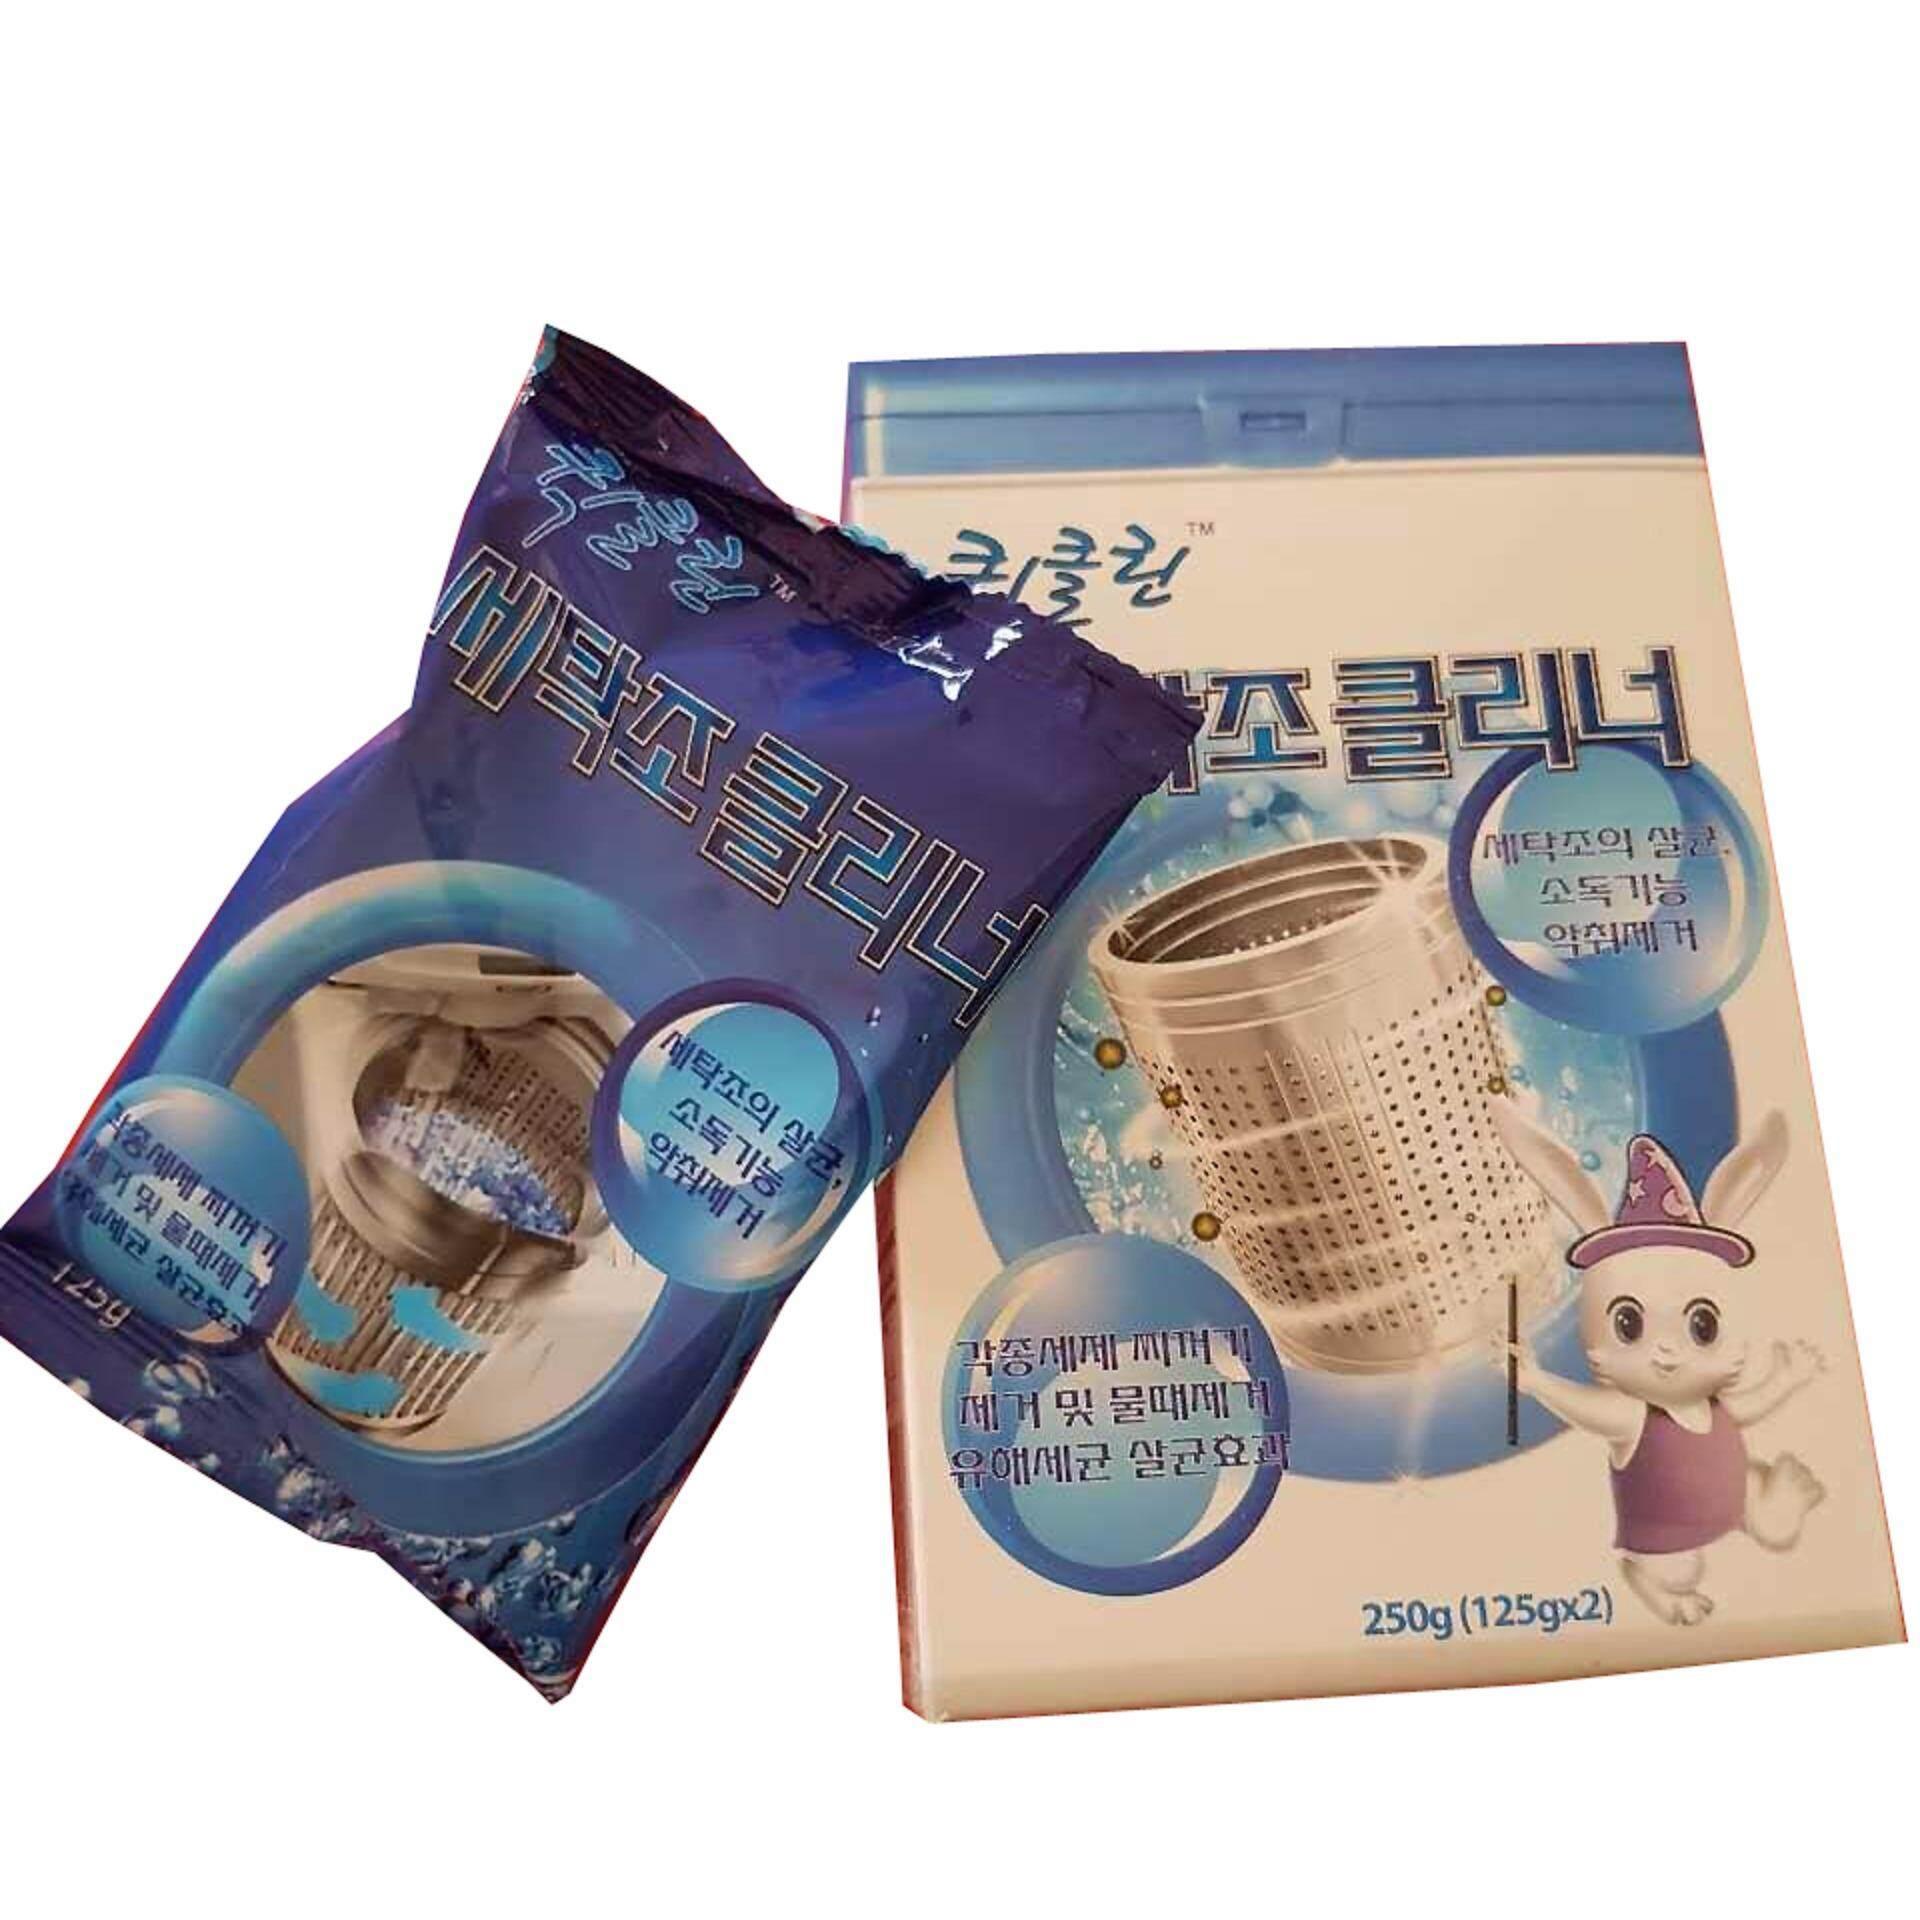 【2 Boxes】Korean Washing Machine Cleaner / Korea Washing Machine Tank Cleaner / Drum Cleaning Powder Detergent